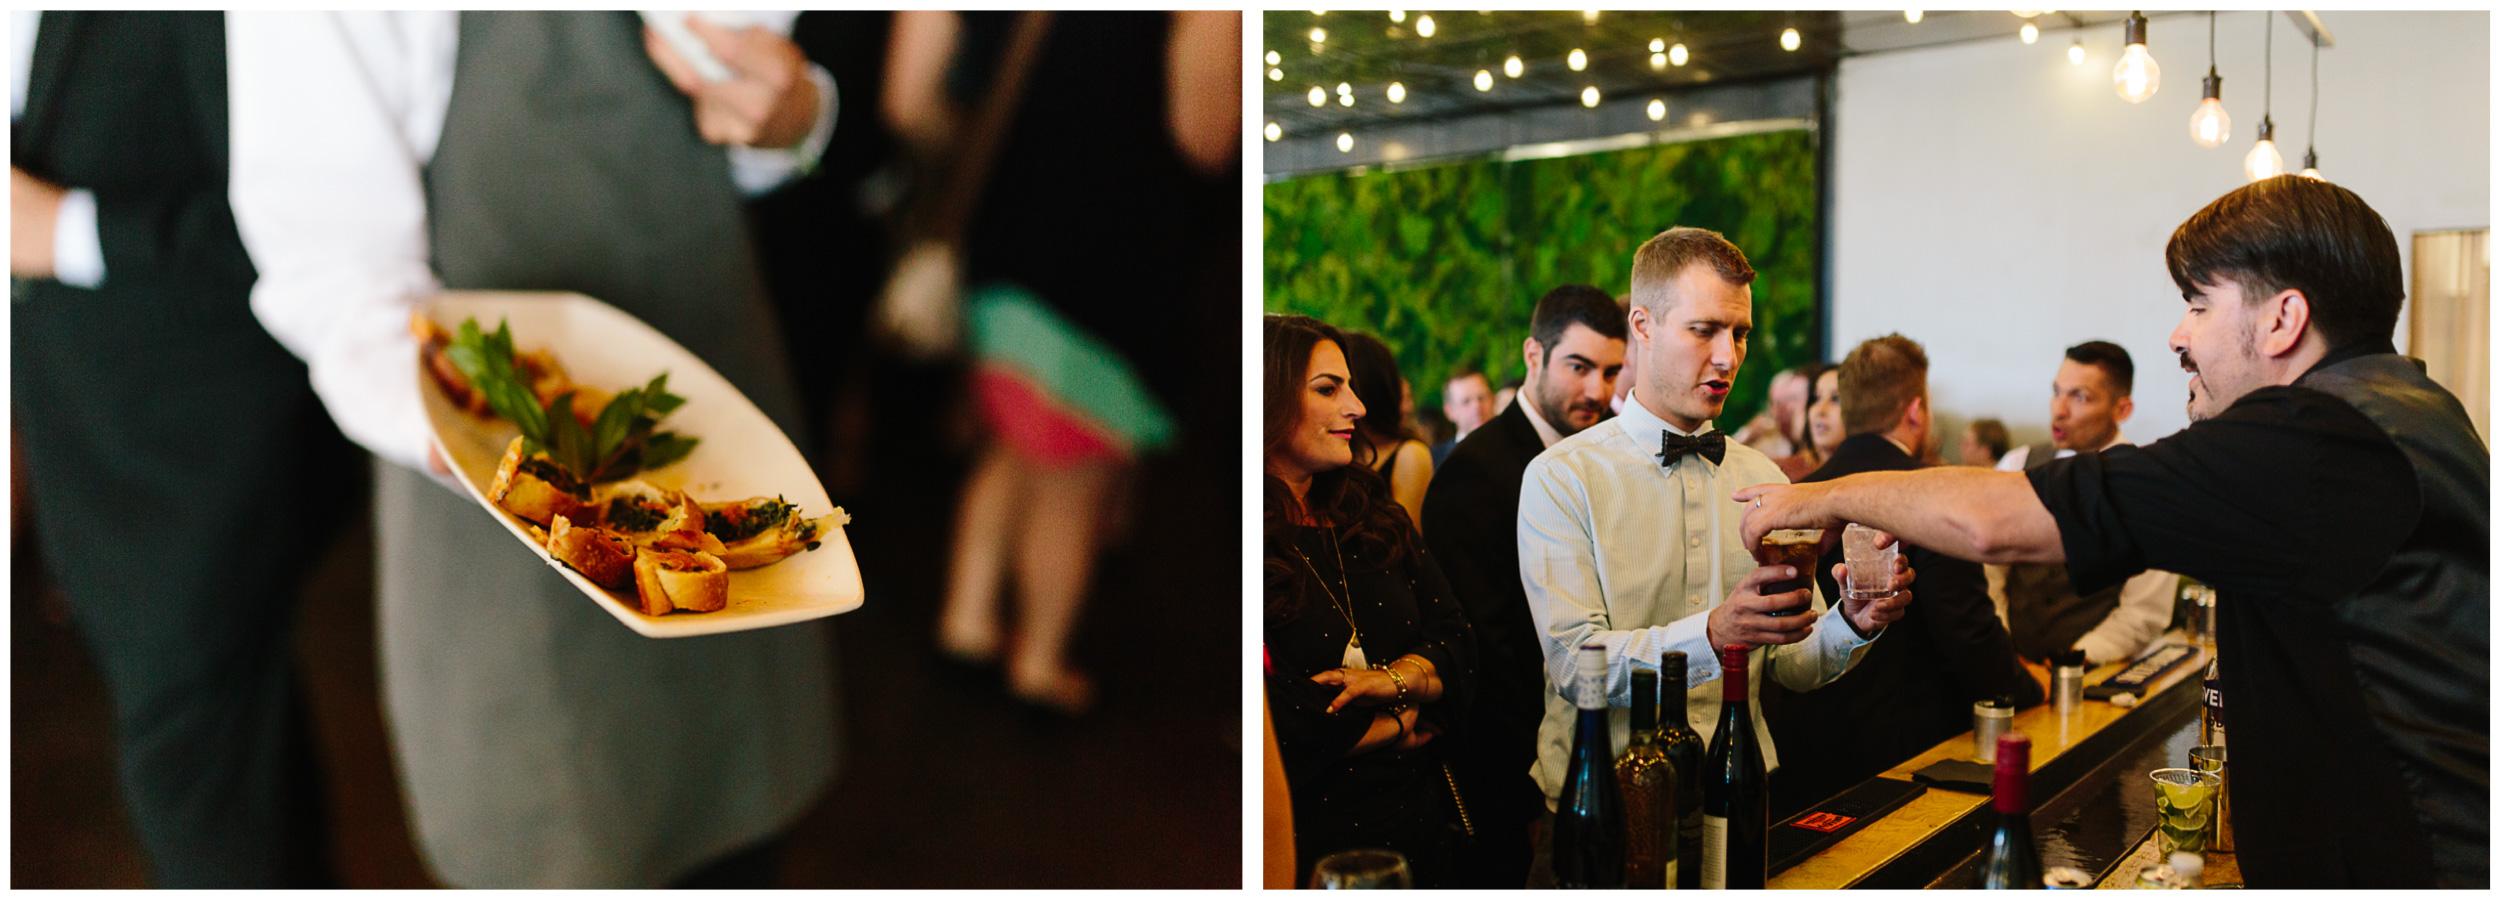 moss_denver_wedding_54.jpg